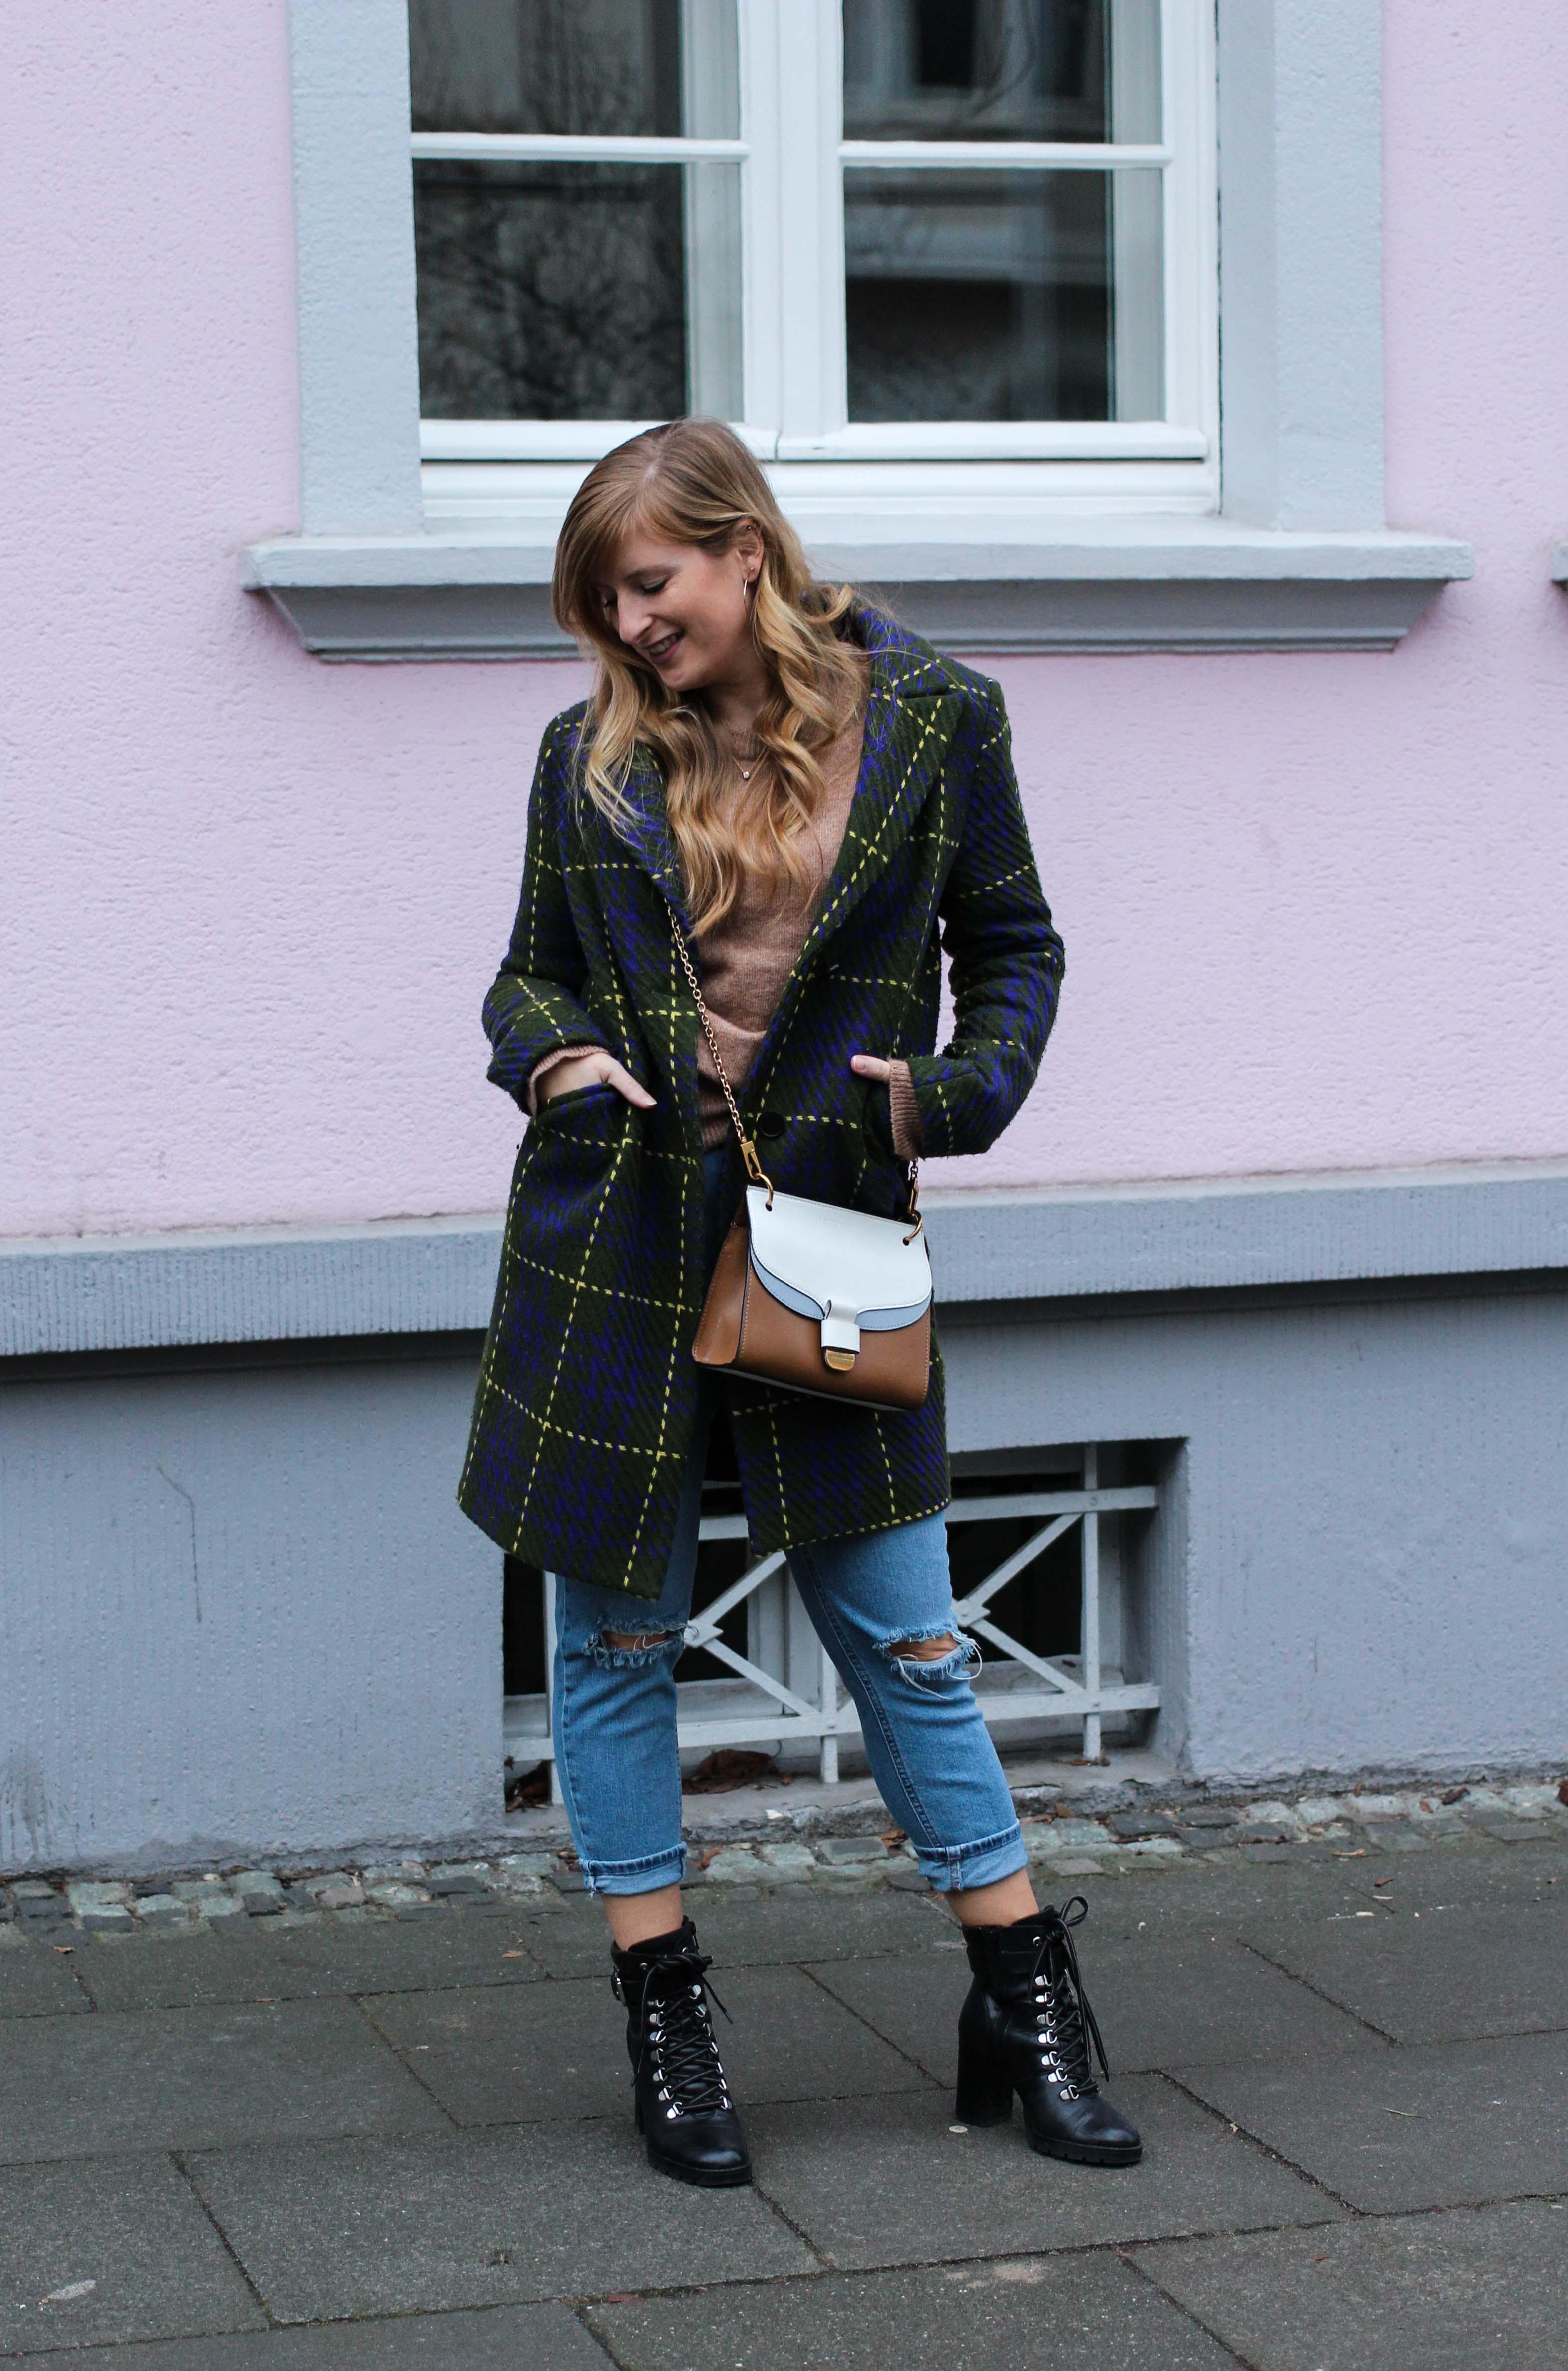 Herbst Must-Have 2019 Karomantel. Herbstmode Herbsttrend Mantel karriert Modeblog Outfit Herbst Fashion Blog Bonn 92